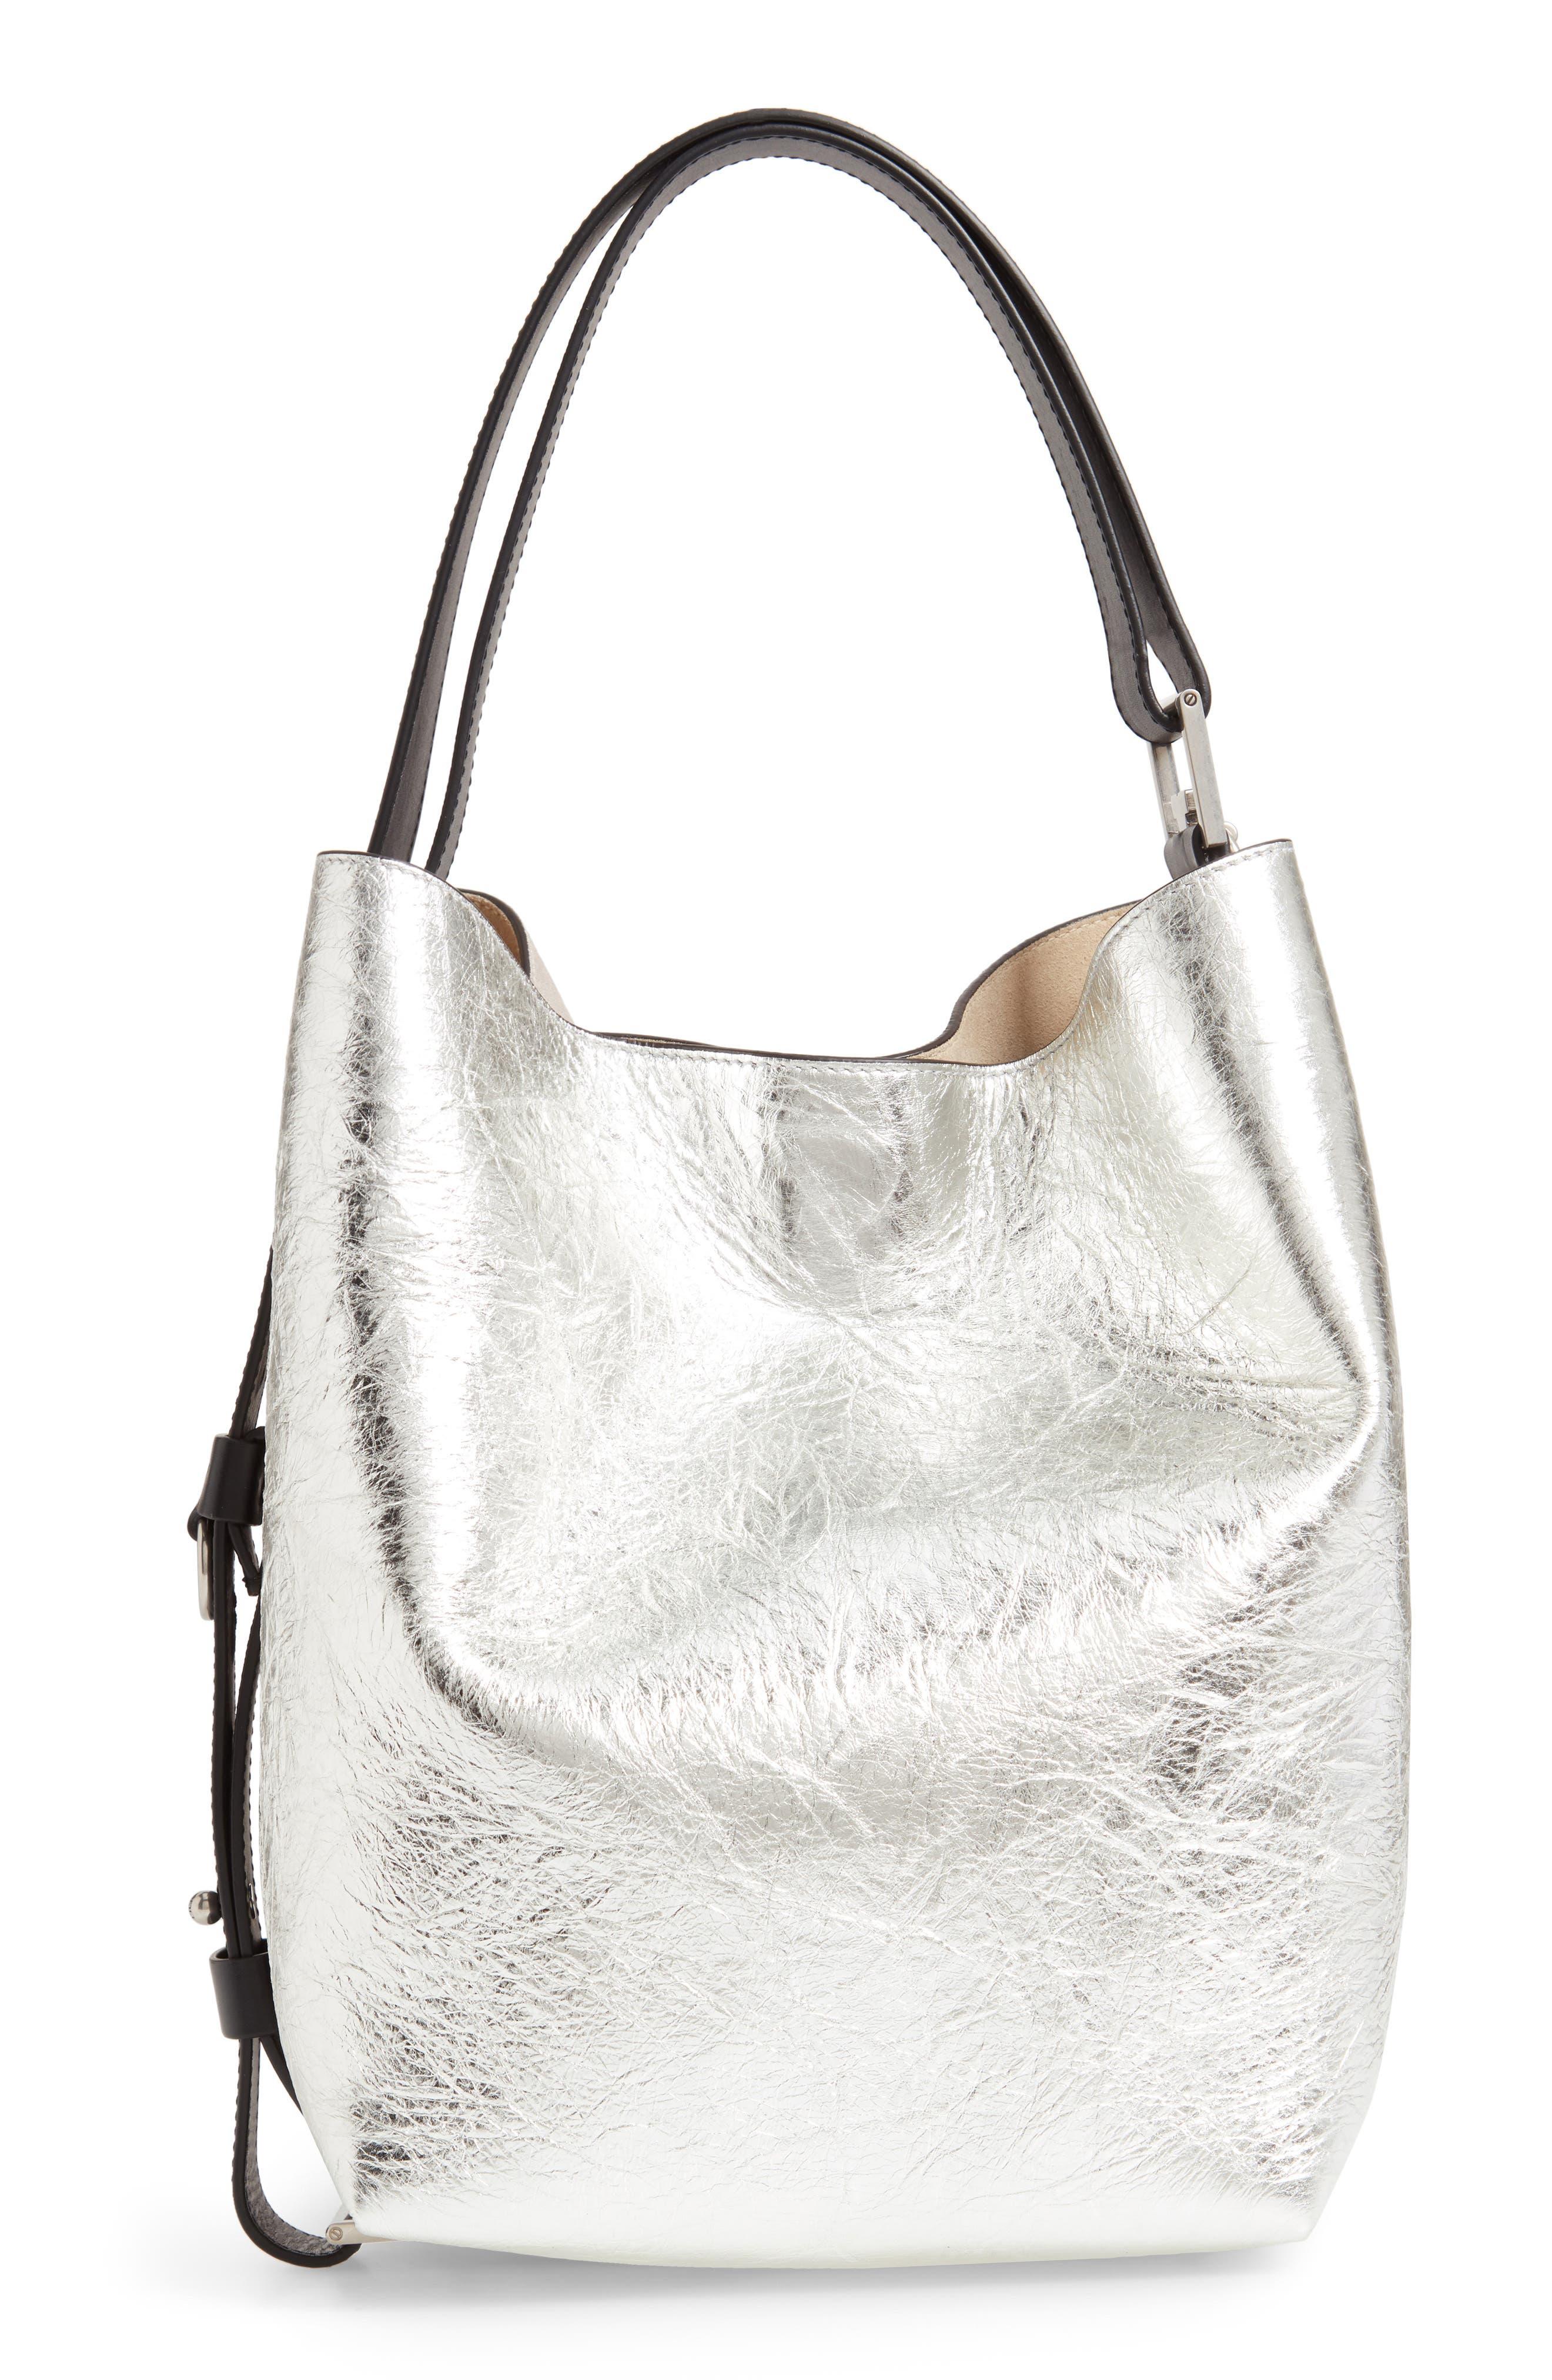 GIVENCHY, Medium GV Calfskin Suede Bucket Bag, Alternate thumbnail 4, color, NATURAL/ SILVER